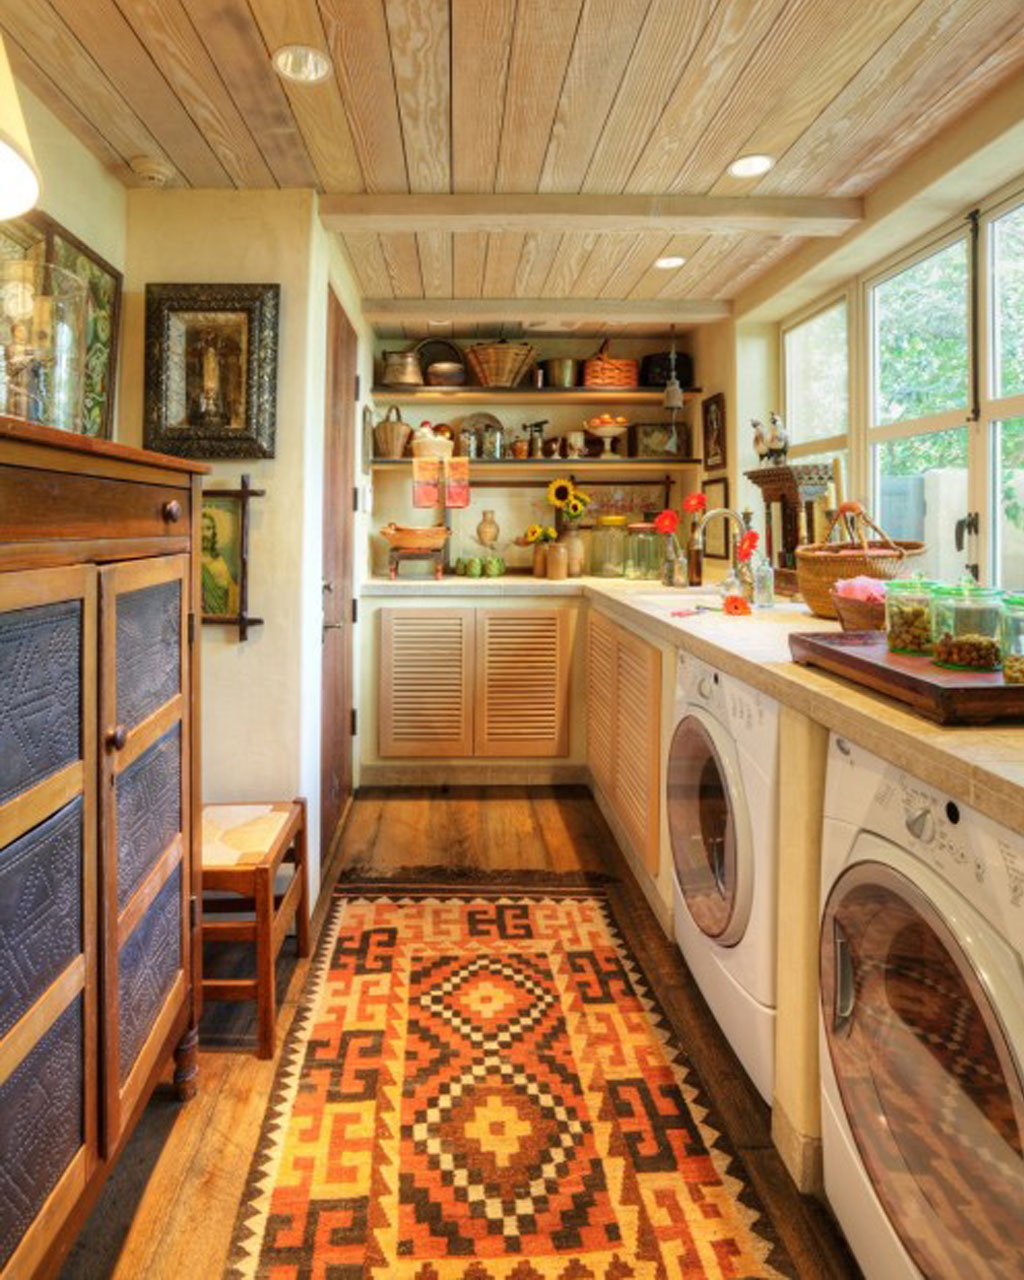 ����� ������ ٢٠١٥ ����� ����� nice-laundry-rooms.jpg